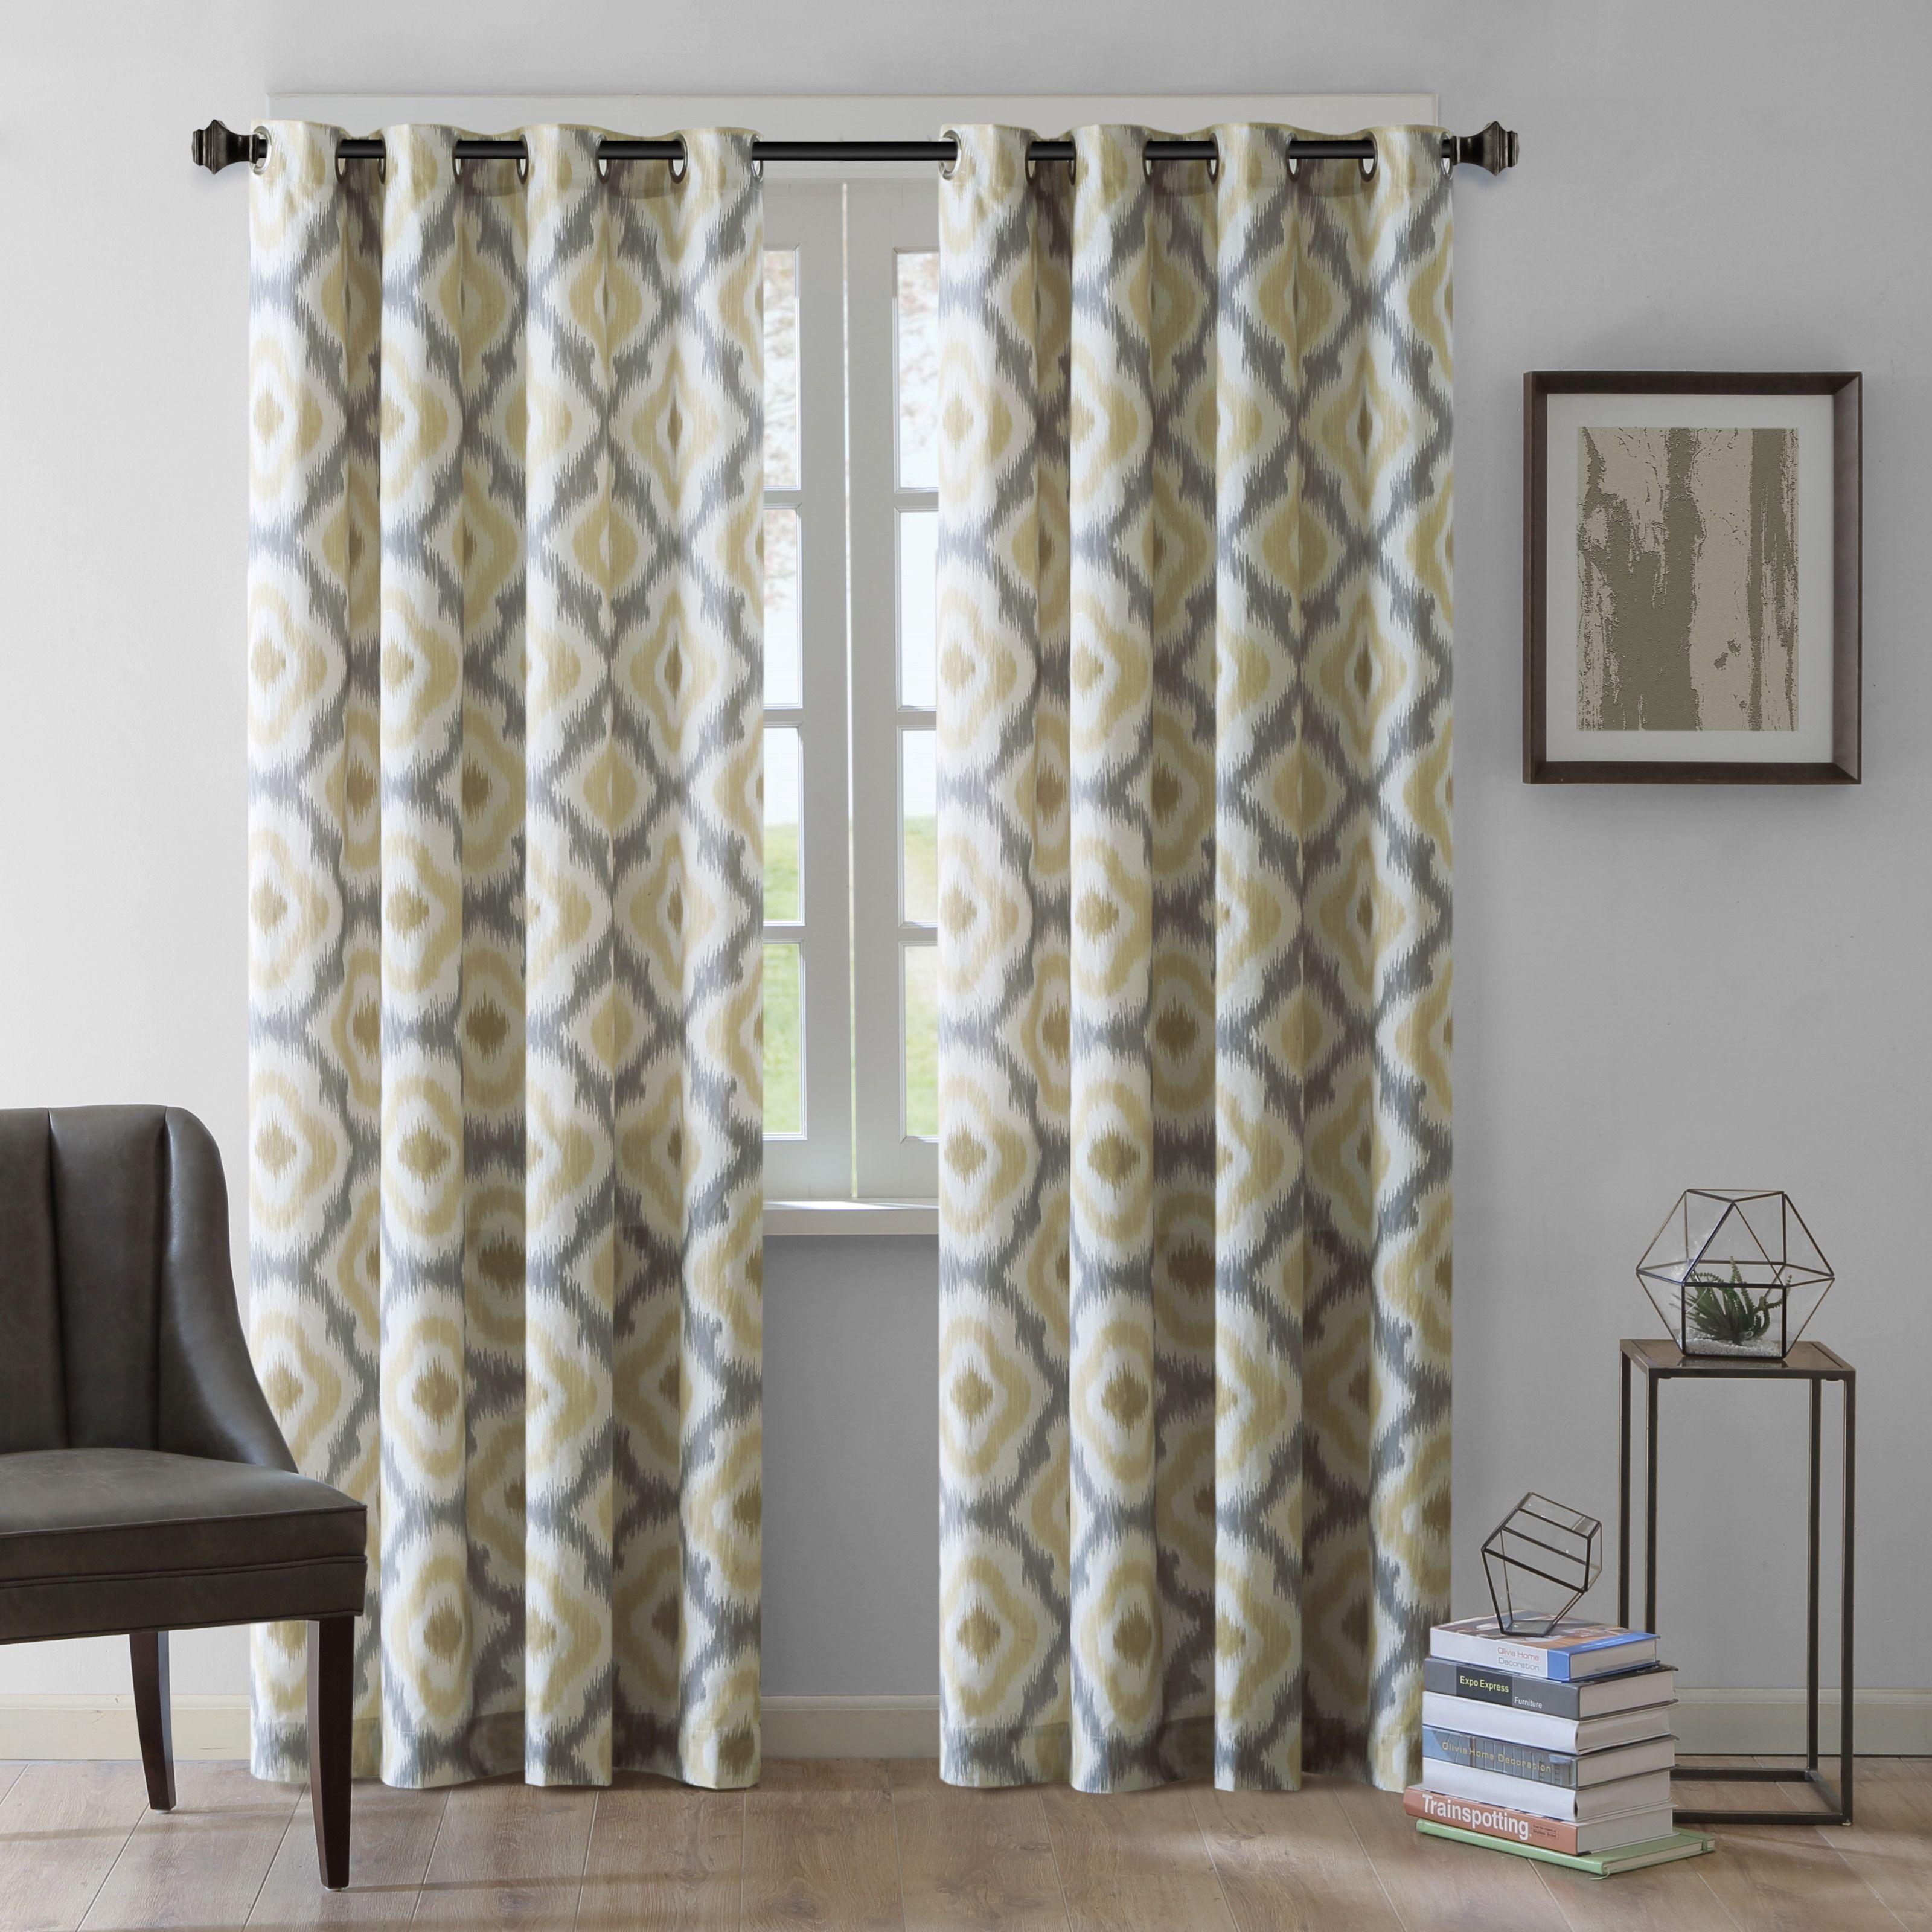 Ink Ivy Ankara Cotton Printed Curtain Panel 108 Taupe